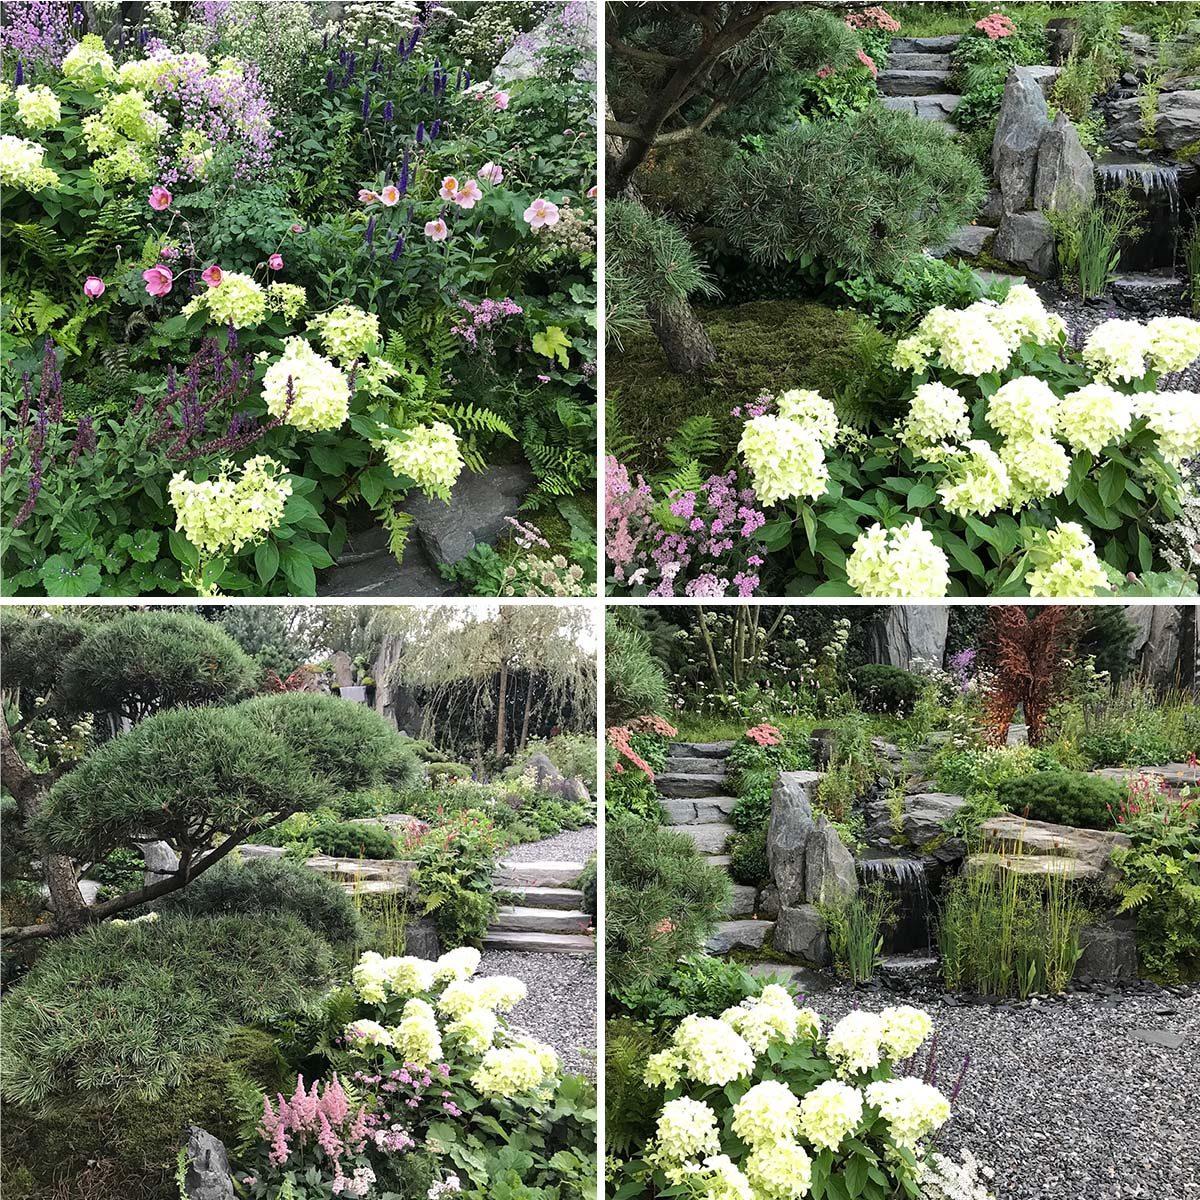 Bodmin show garden Chelsea 2021